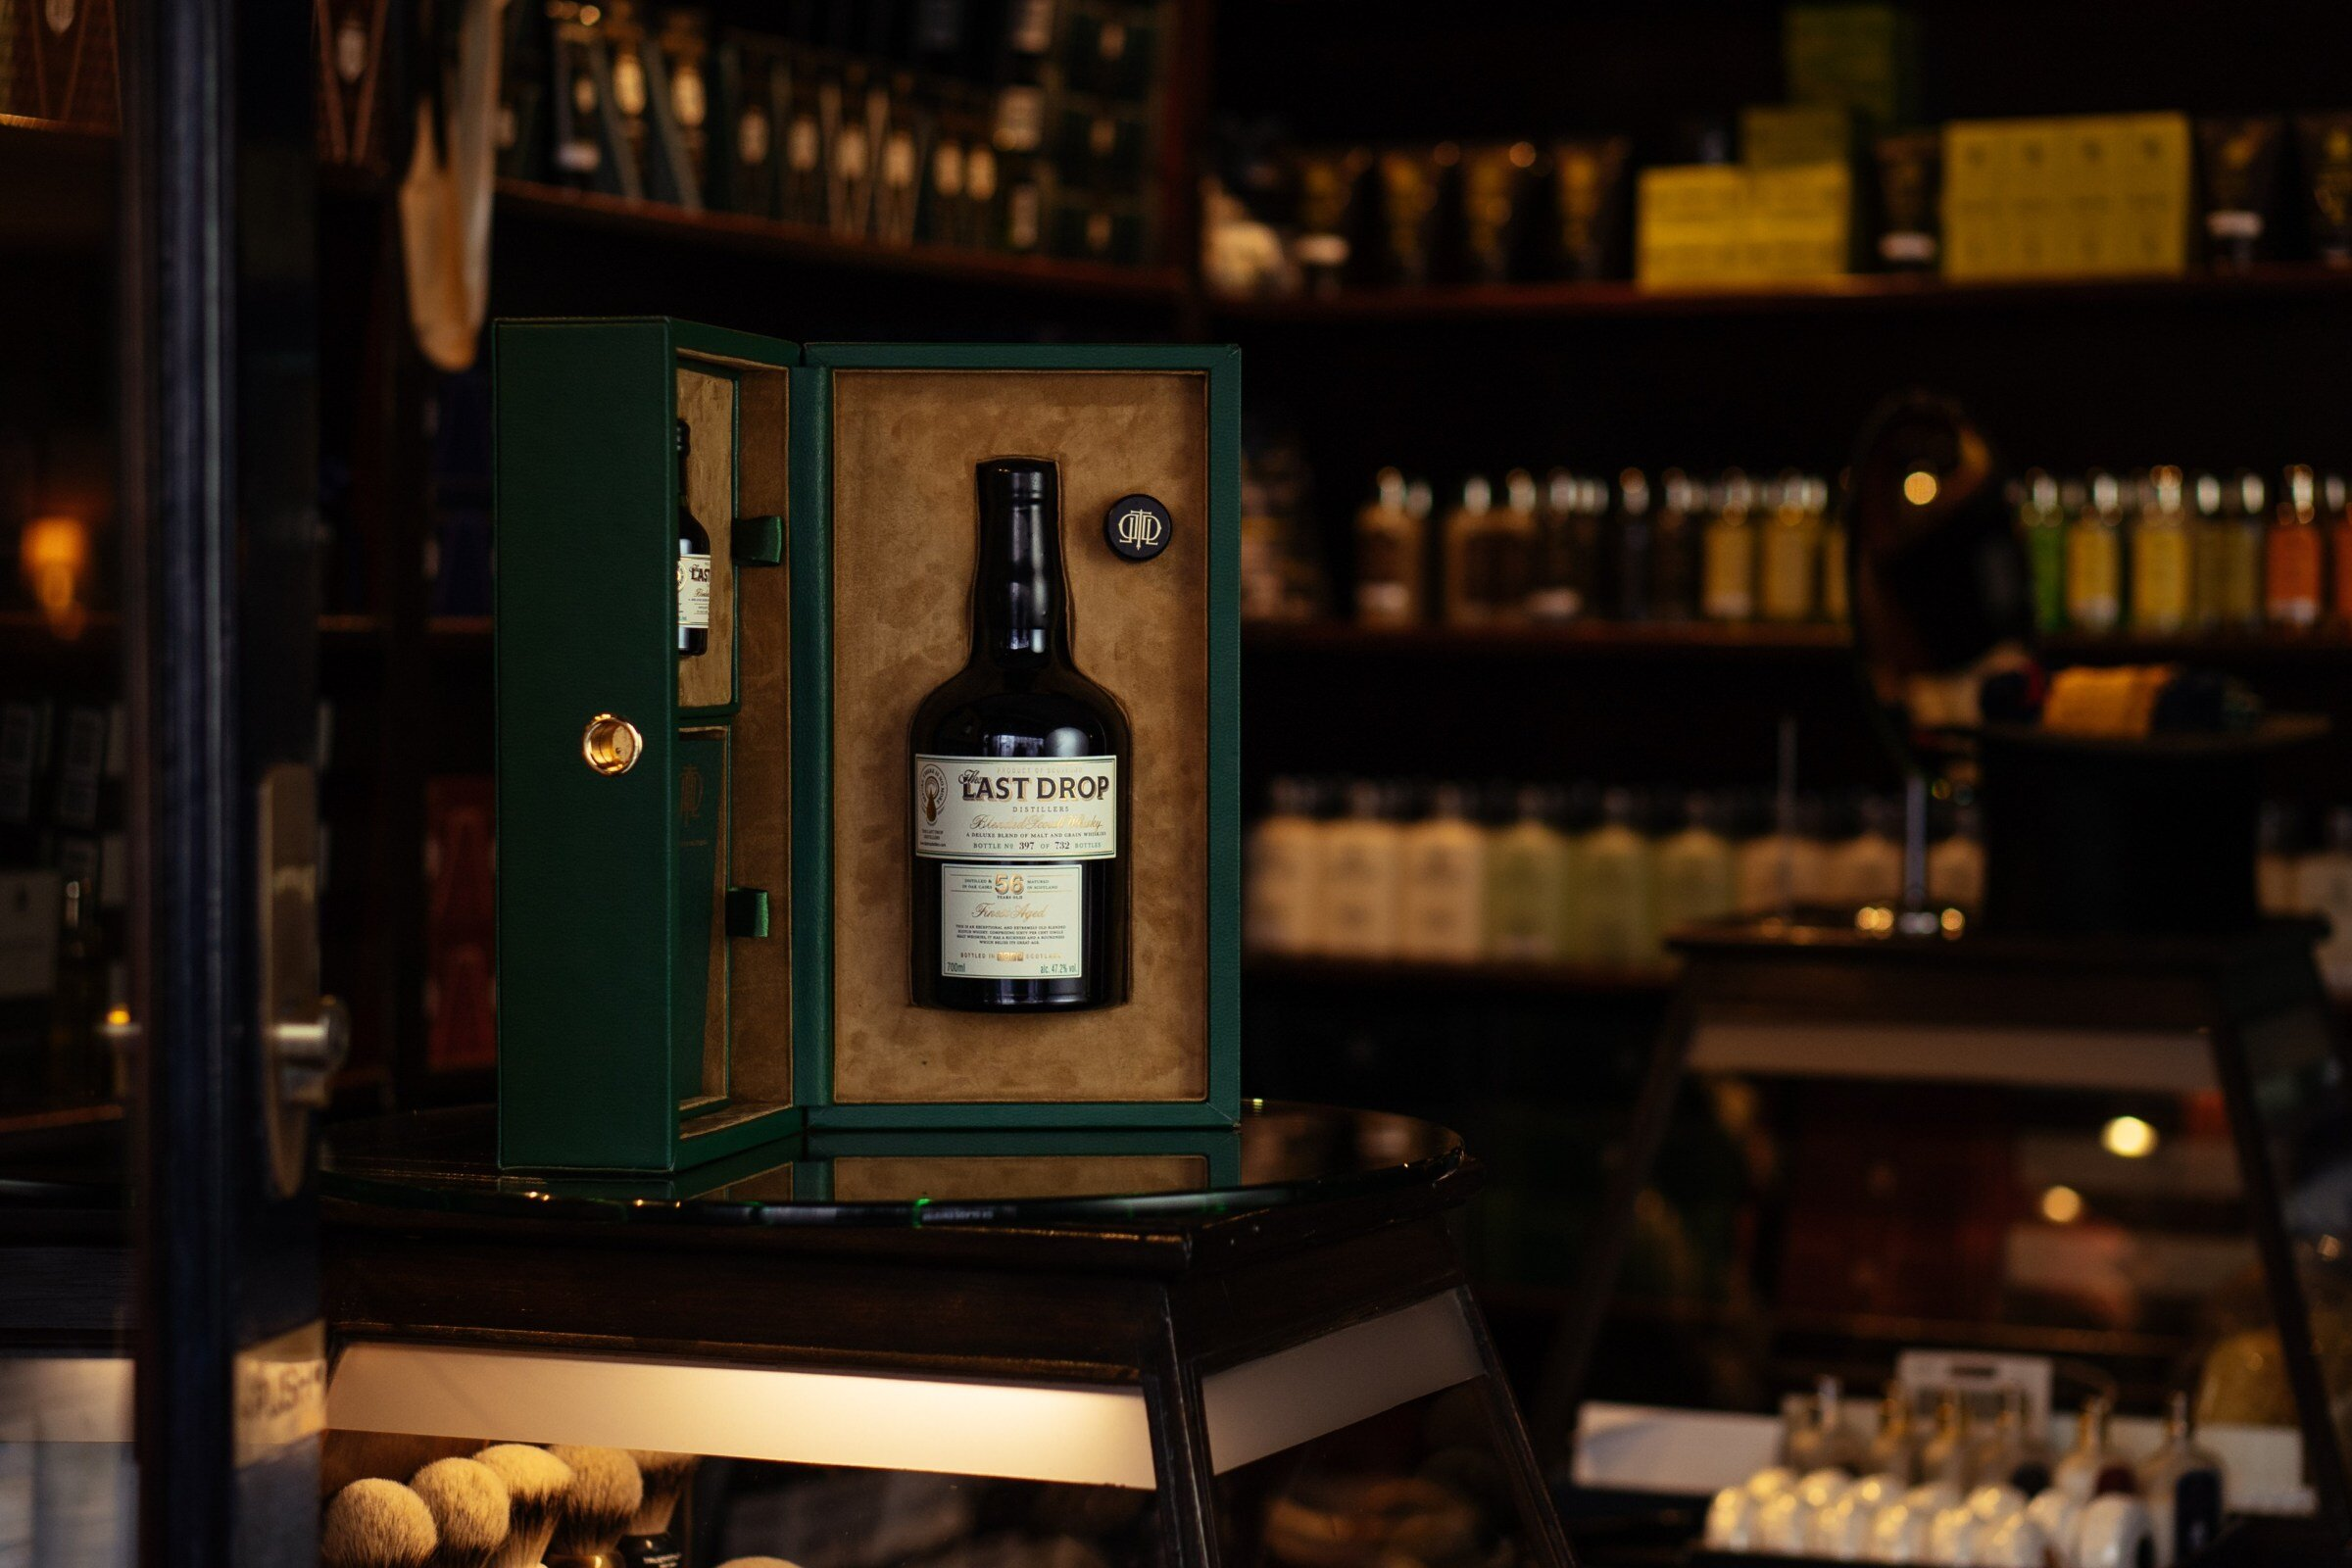 Truefitt & Hill partners with The Last Drop Distillers